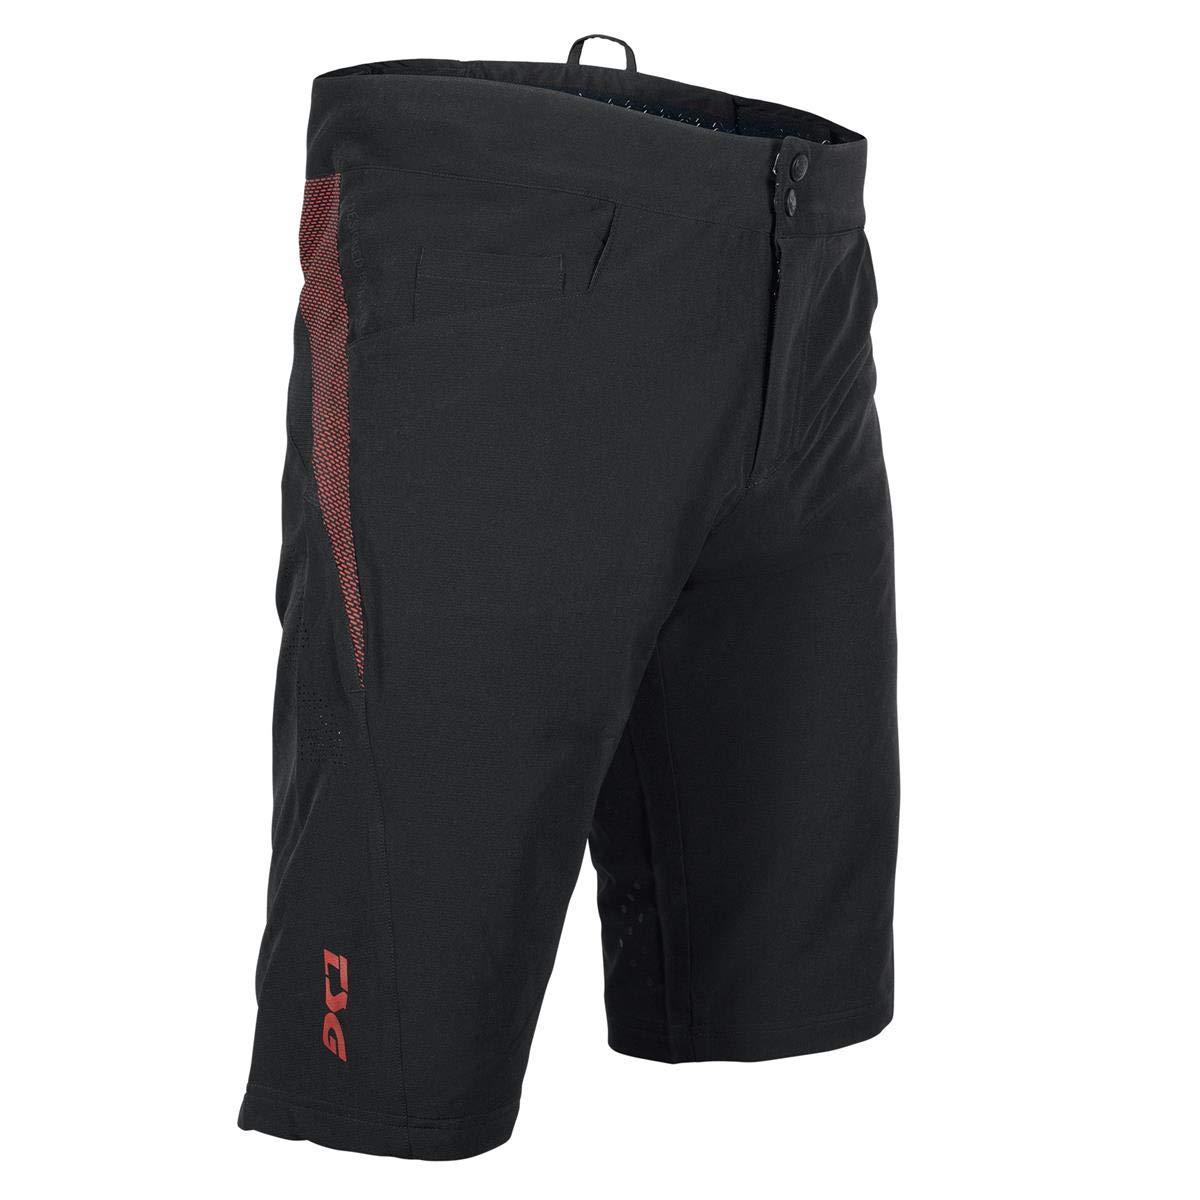 TSG Herren STG Sp4 Short Kurze Hose, Noir-Rouge-Vin, XL